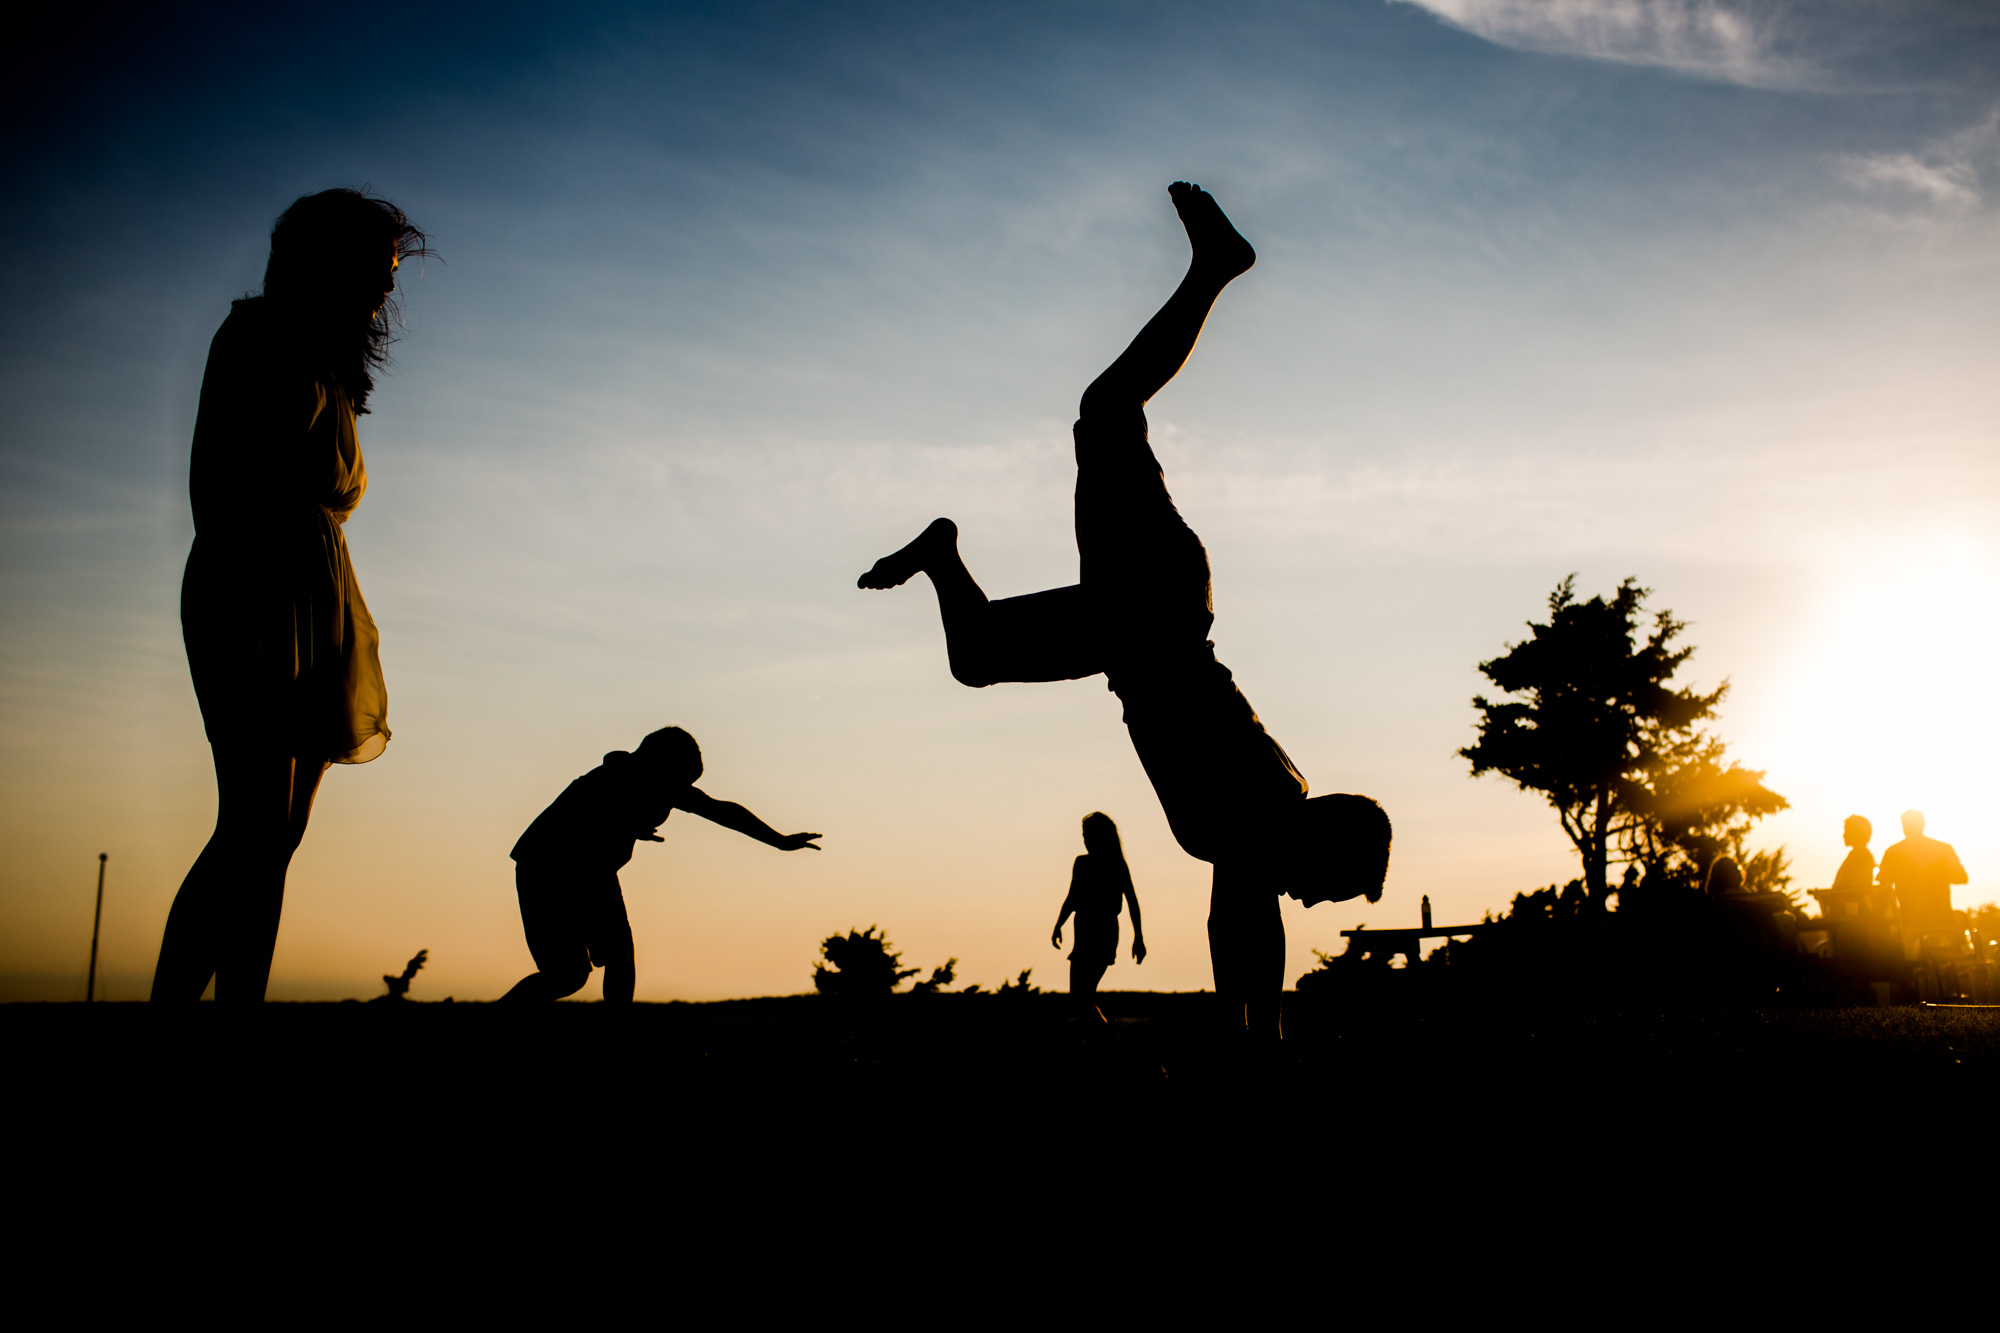 silhouette of boy flipping